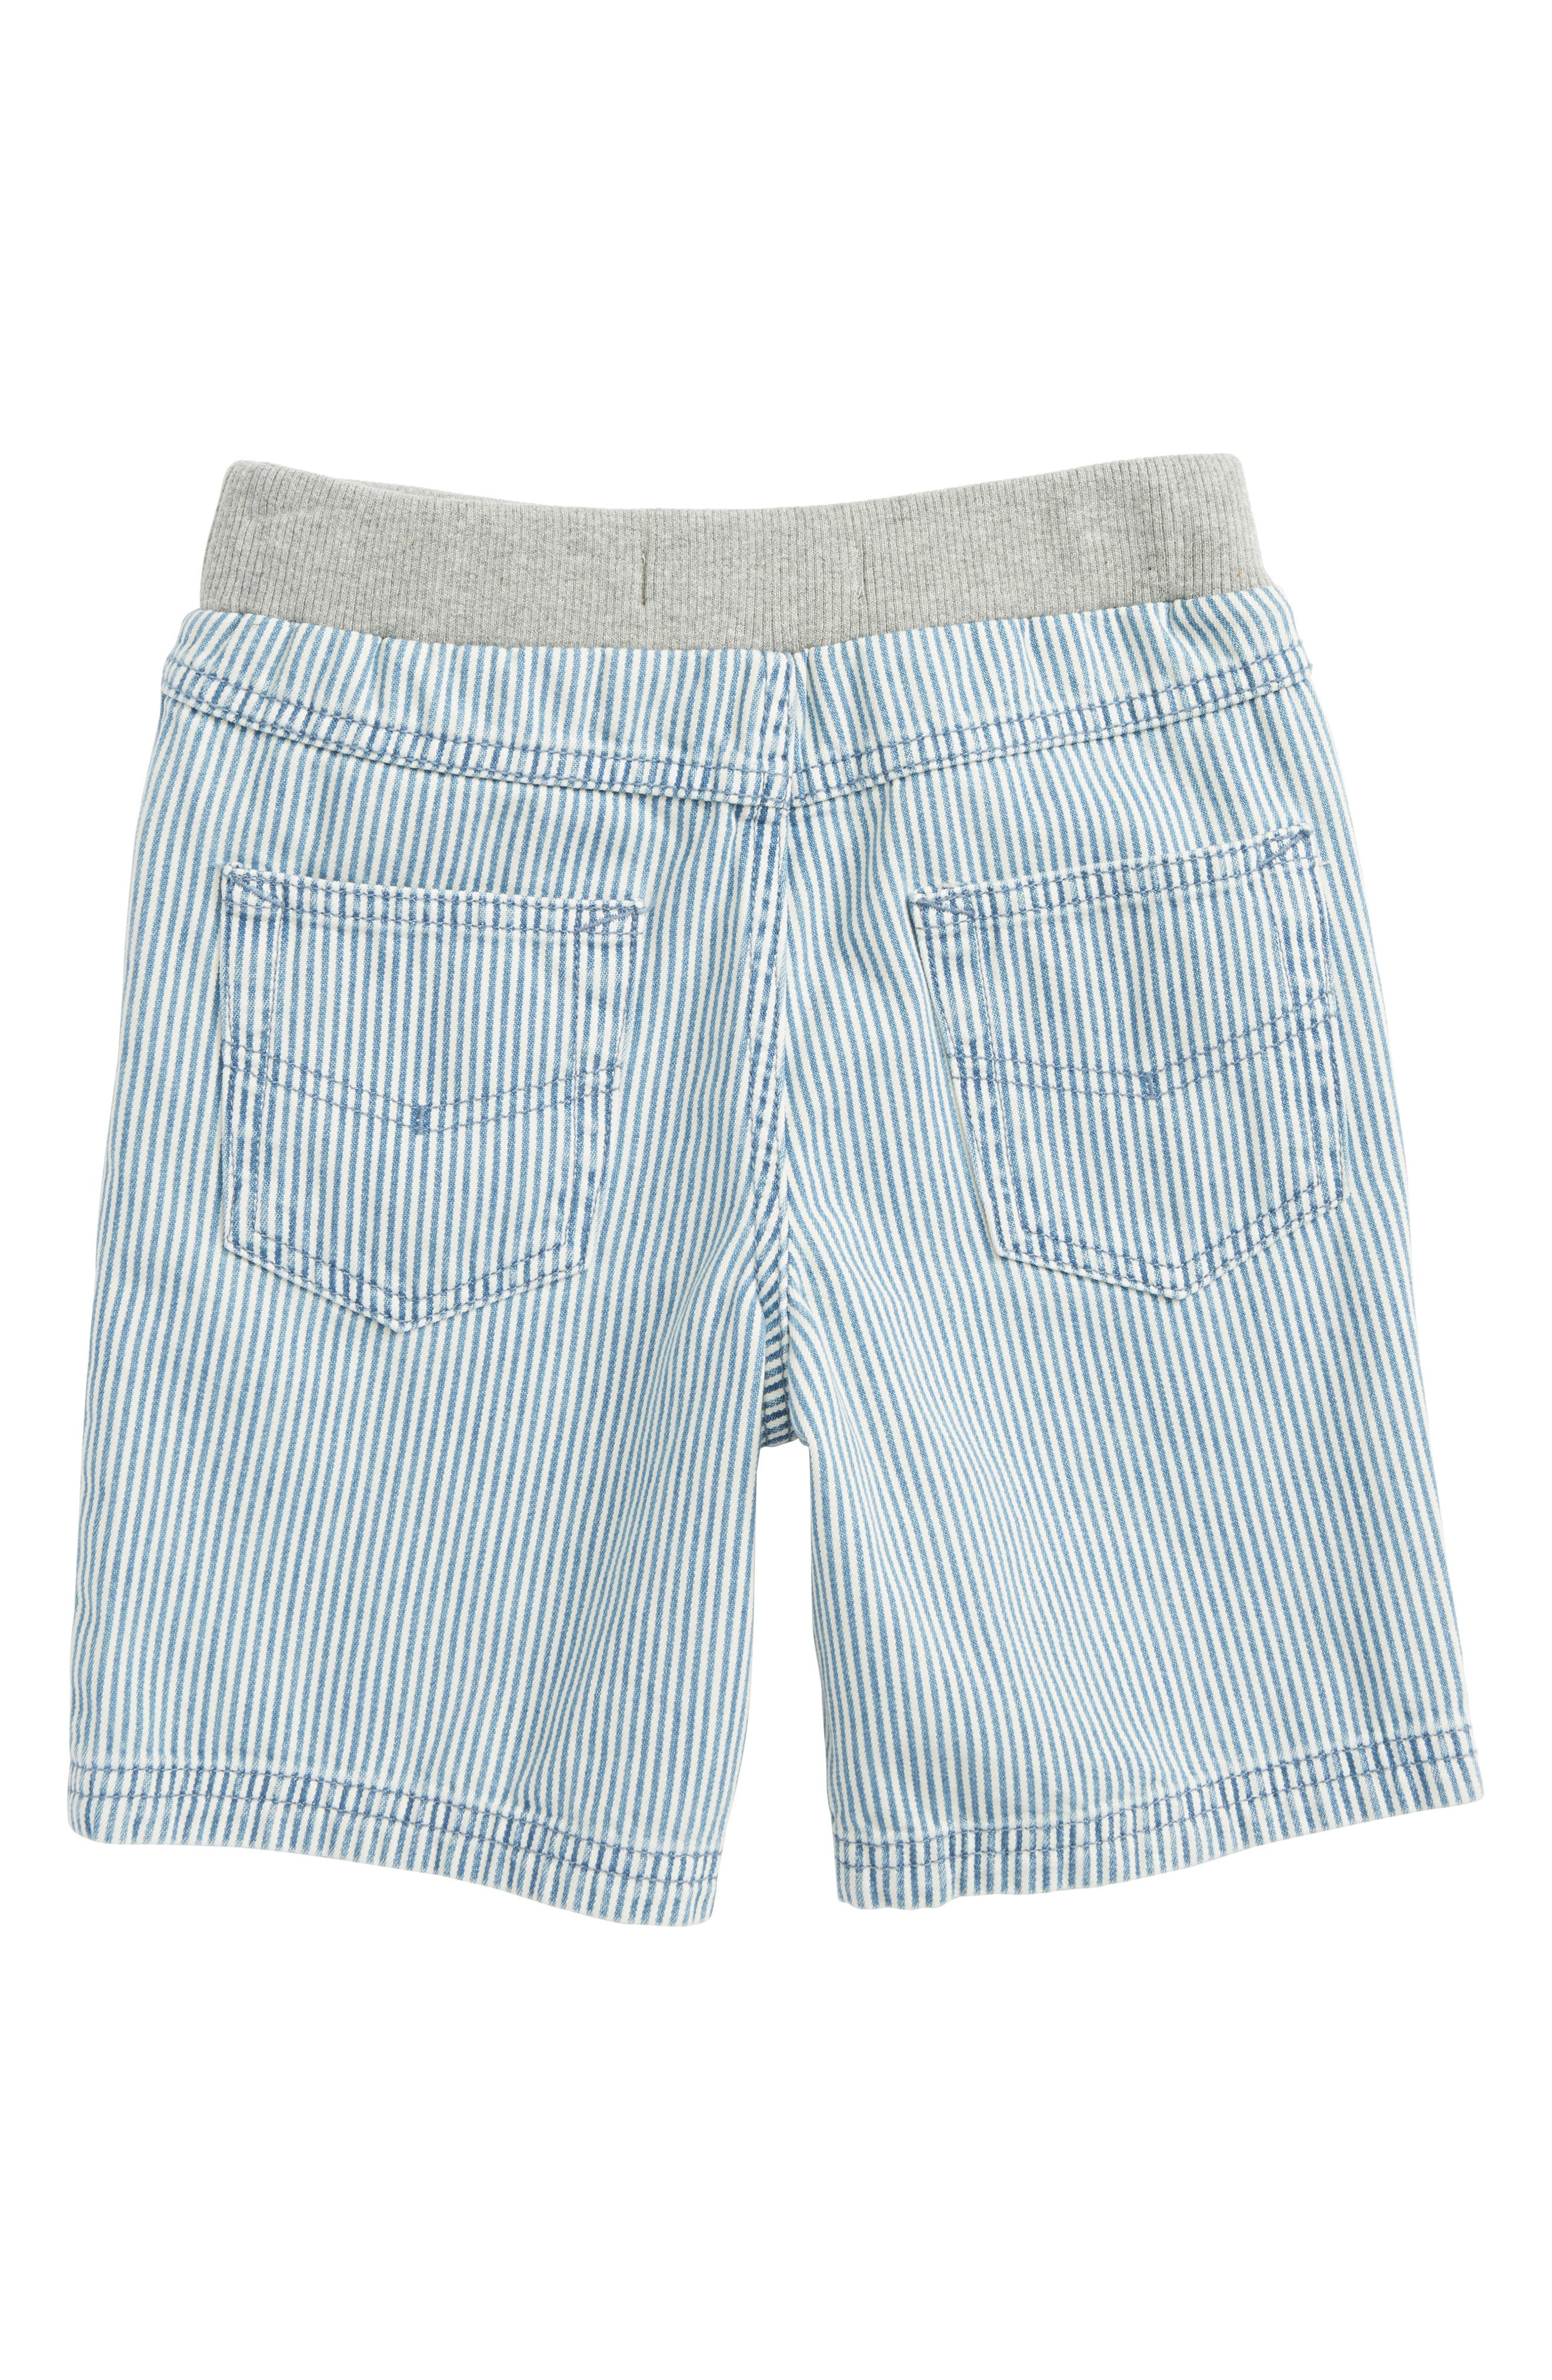 Stripe Shorts,                             Alternate thumbnail 2, color,                             Sanford Wash